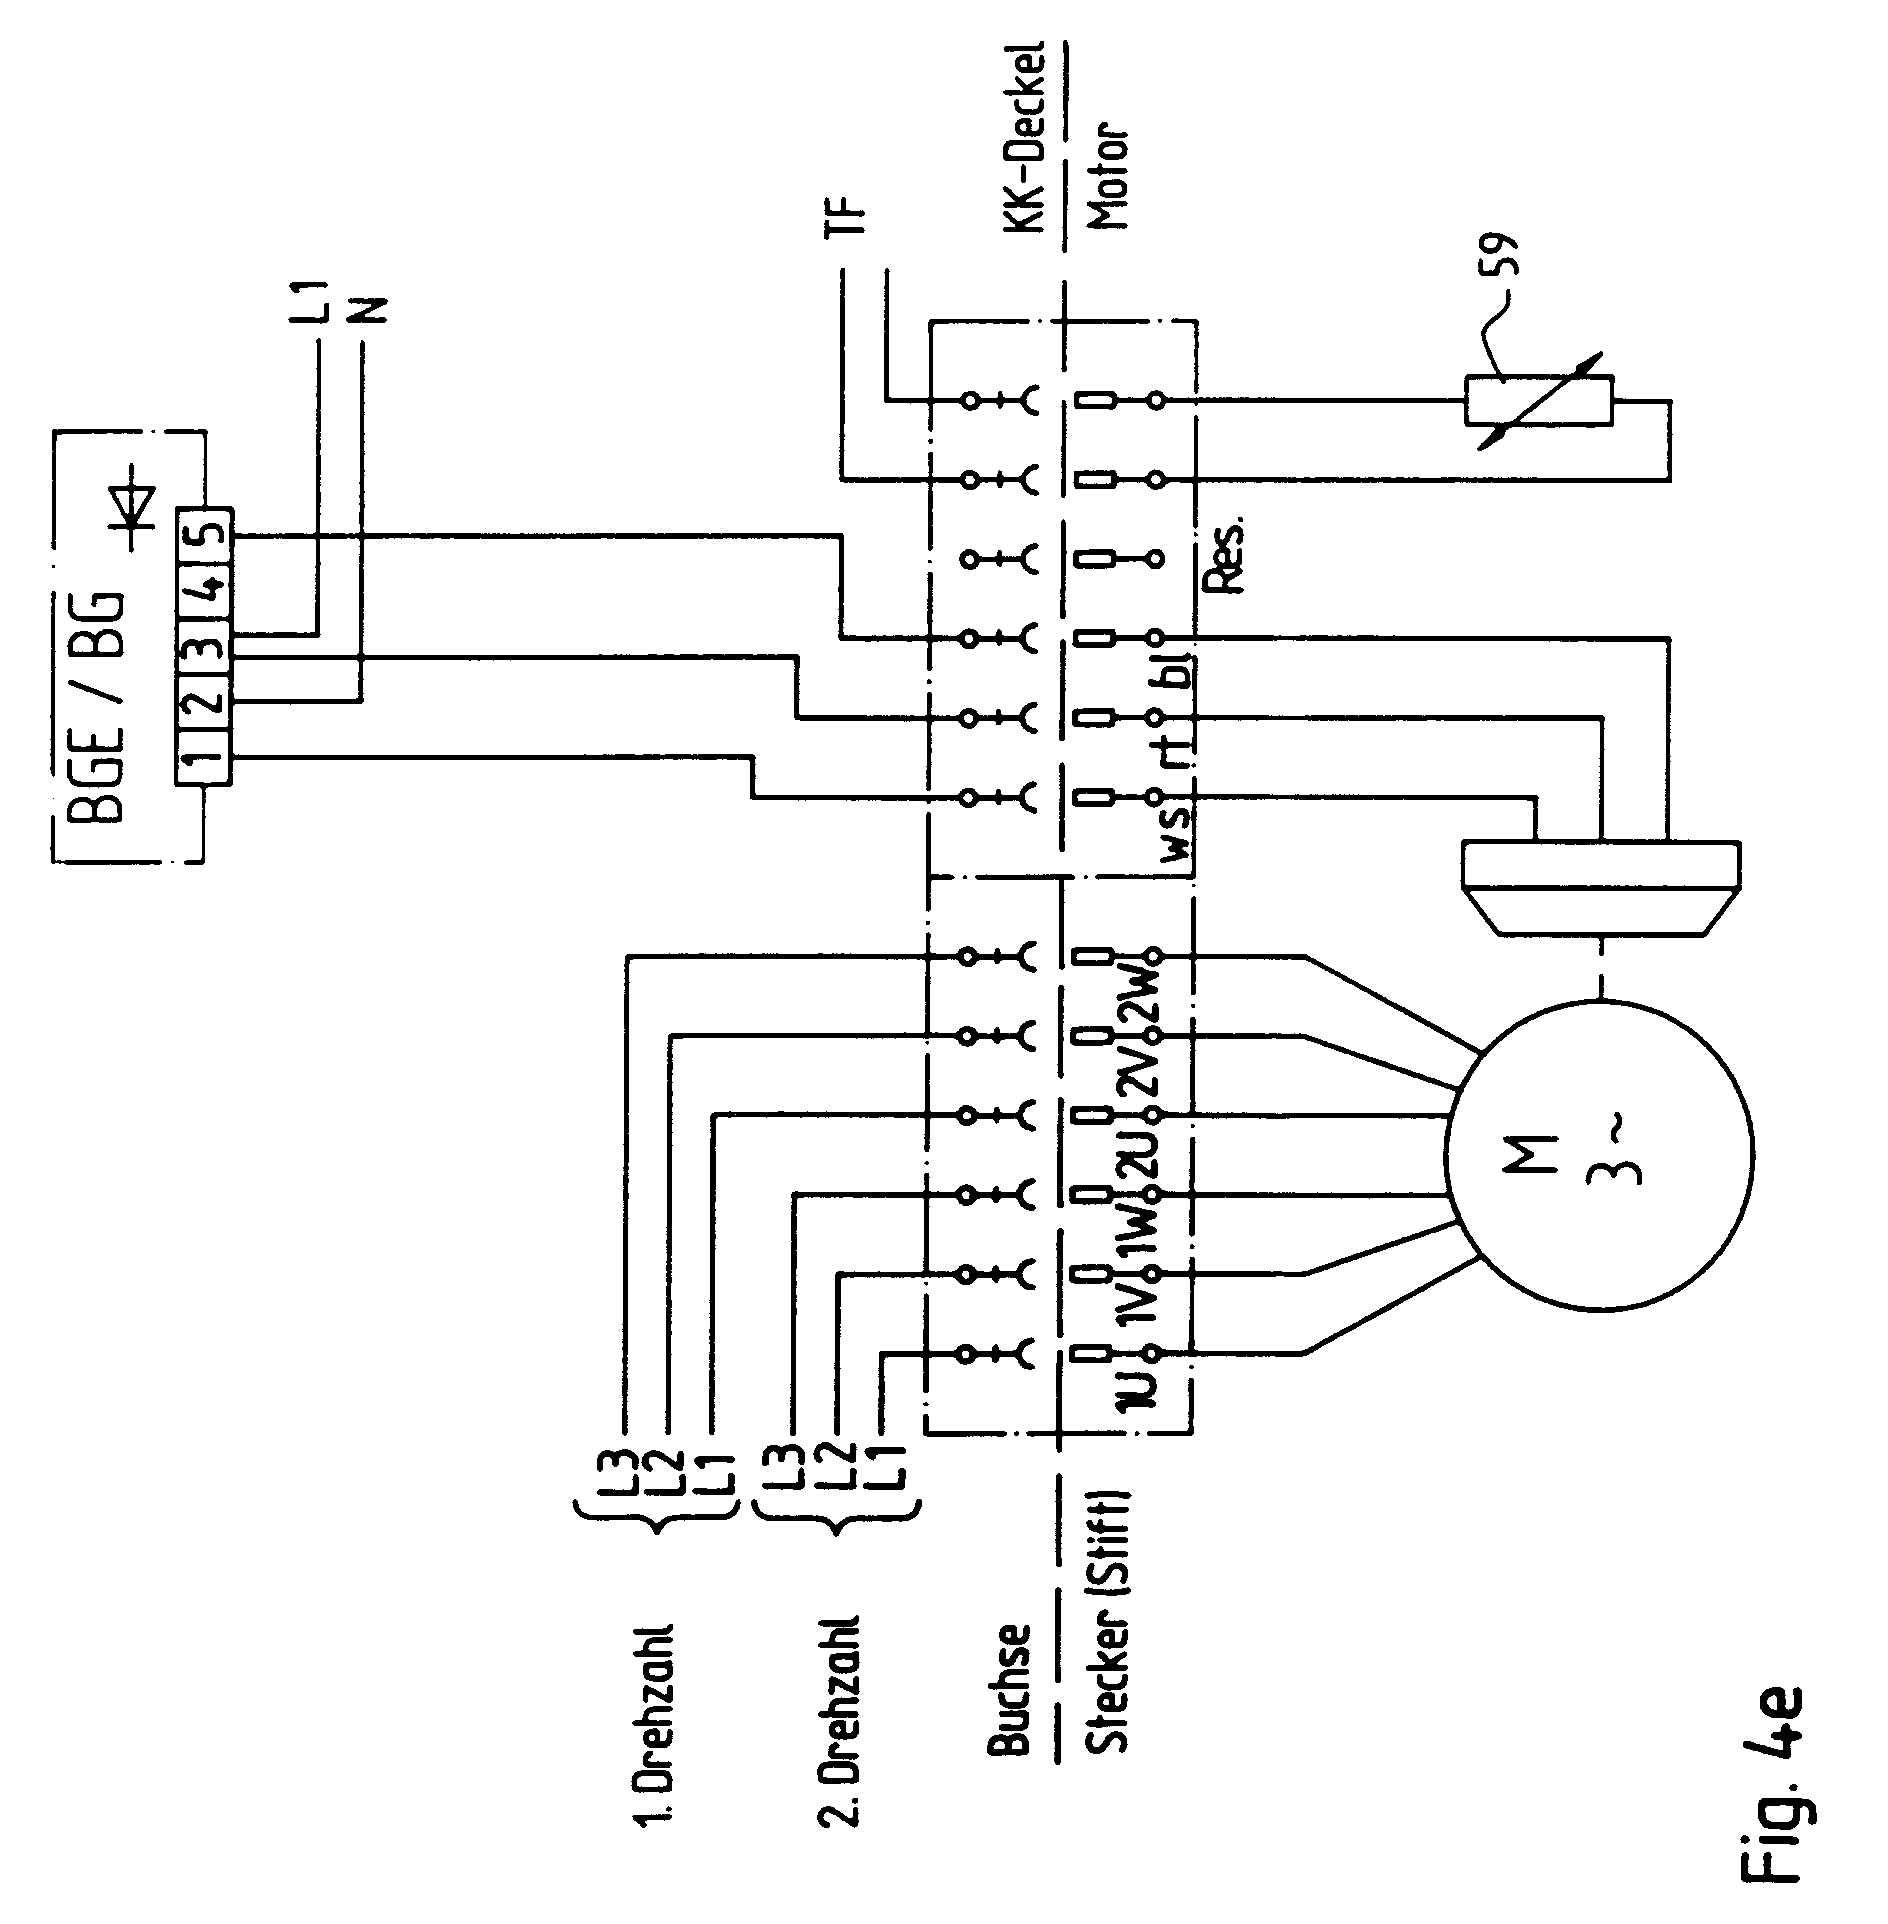 bf0f2 sew motor wiring diagram